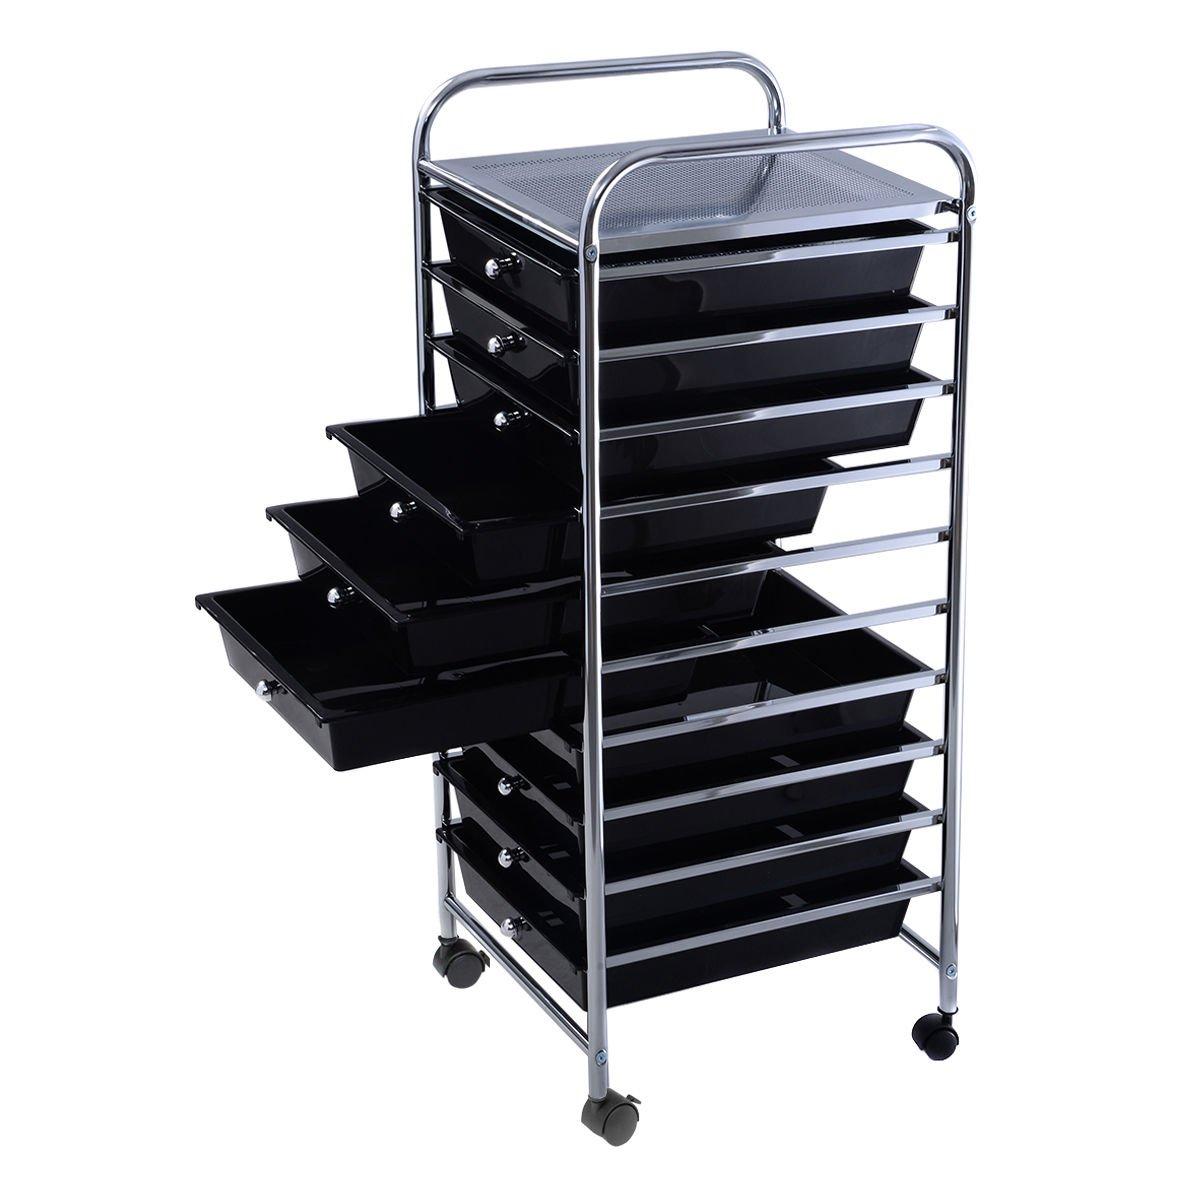 Officejoy 10 Drawer Storage Cart Rolling Cart File Scrapbook Paper Mobile Organizer for School Office (Black)